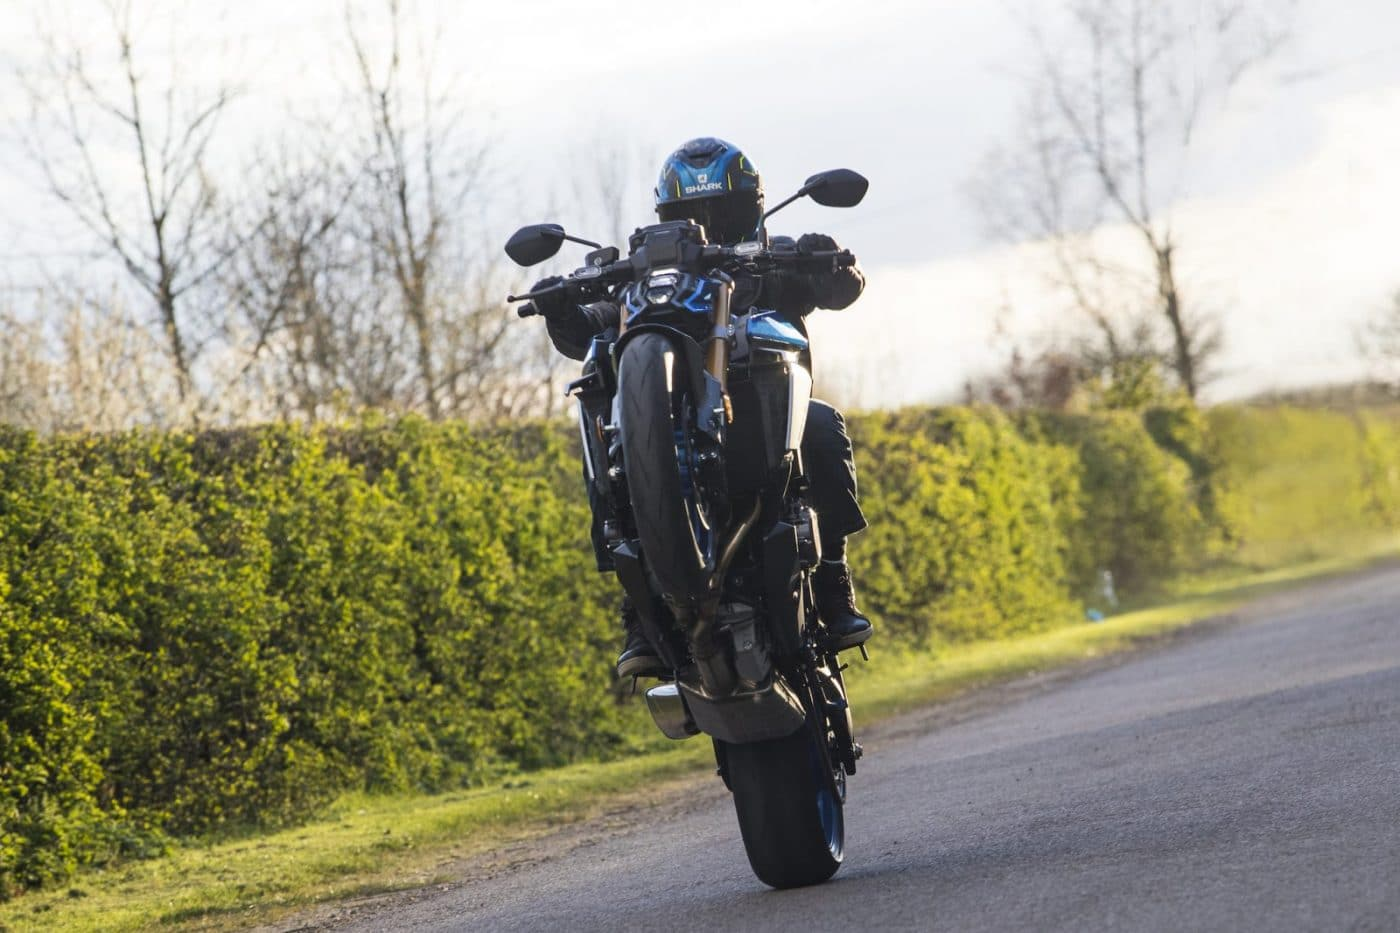 2021: De nieuwe Suzuki GSX-S1000